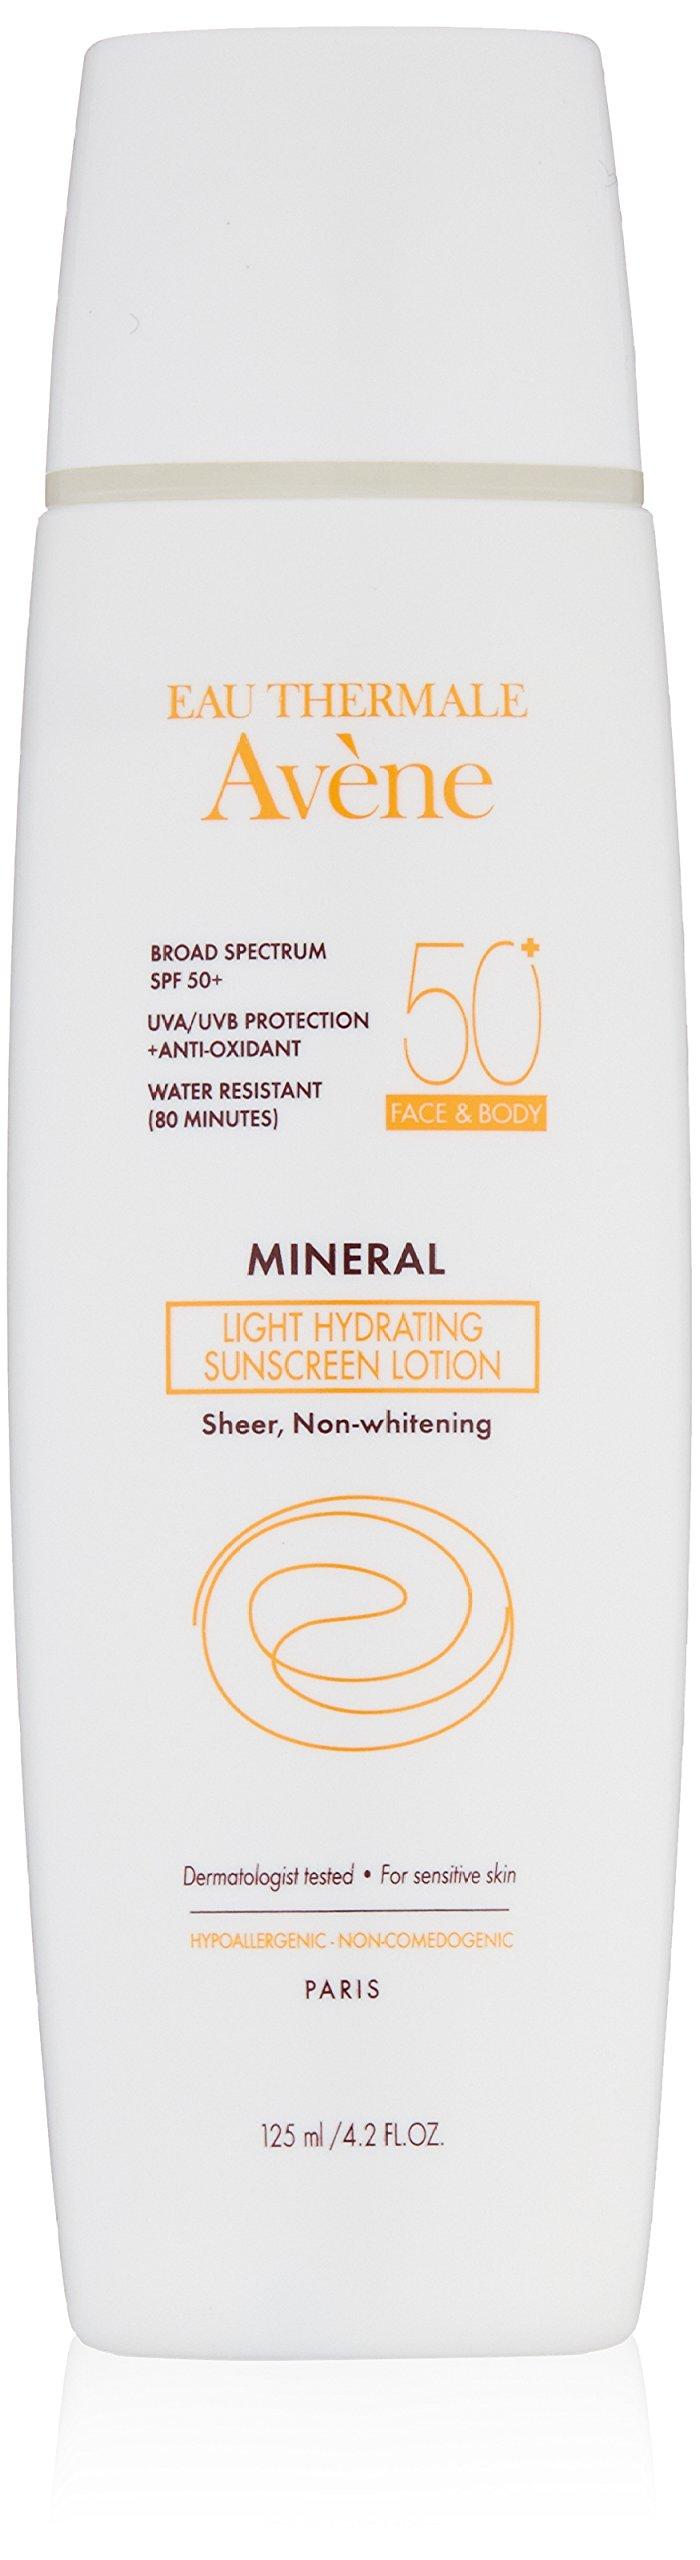 Eau Thermale Avène Mineral Light SPF 50 Plus Hydrating Sunscreen Lotion, 4.2 fl. oz.